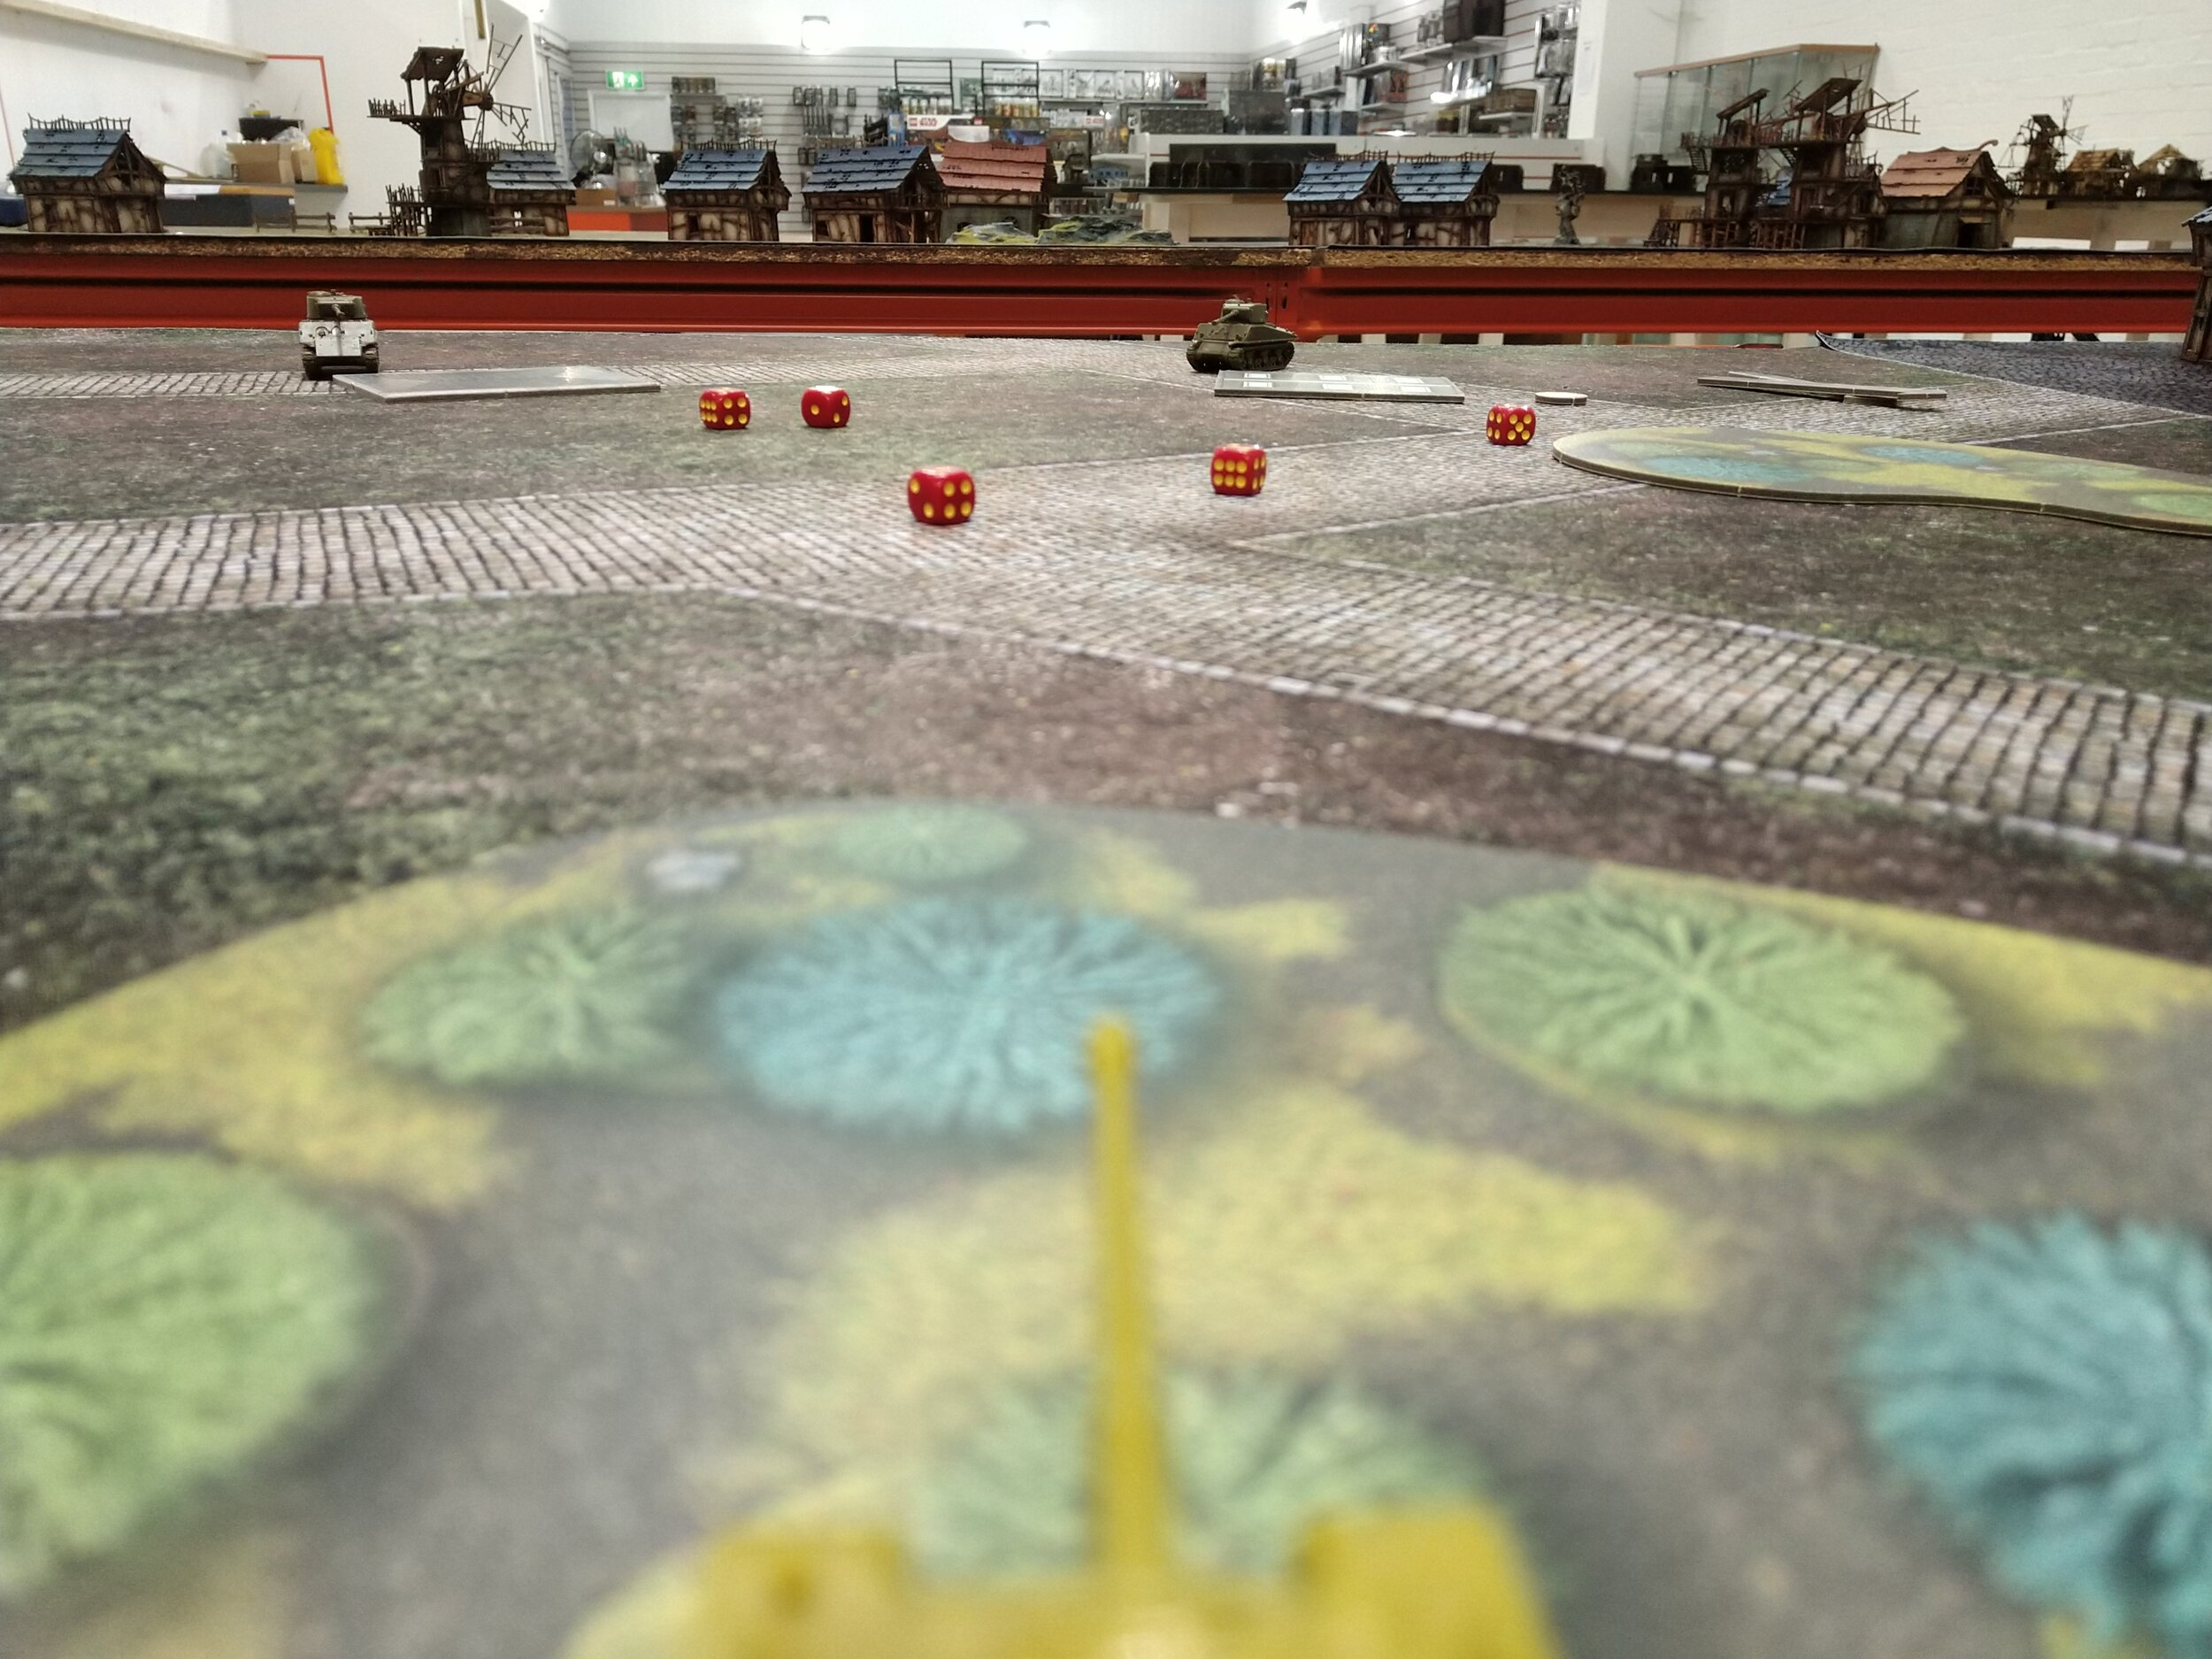 Tanks tabletop miniature game